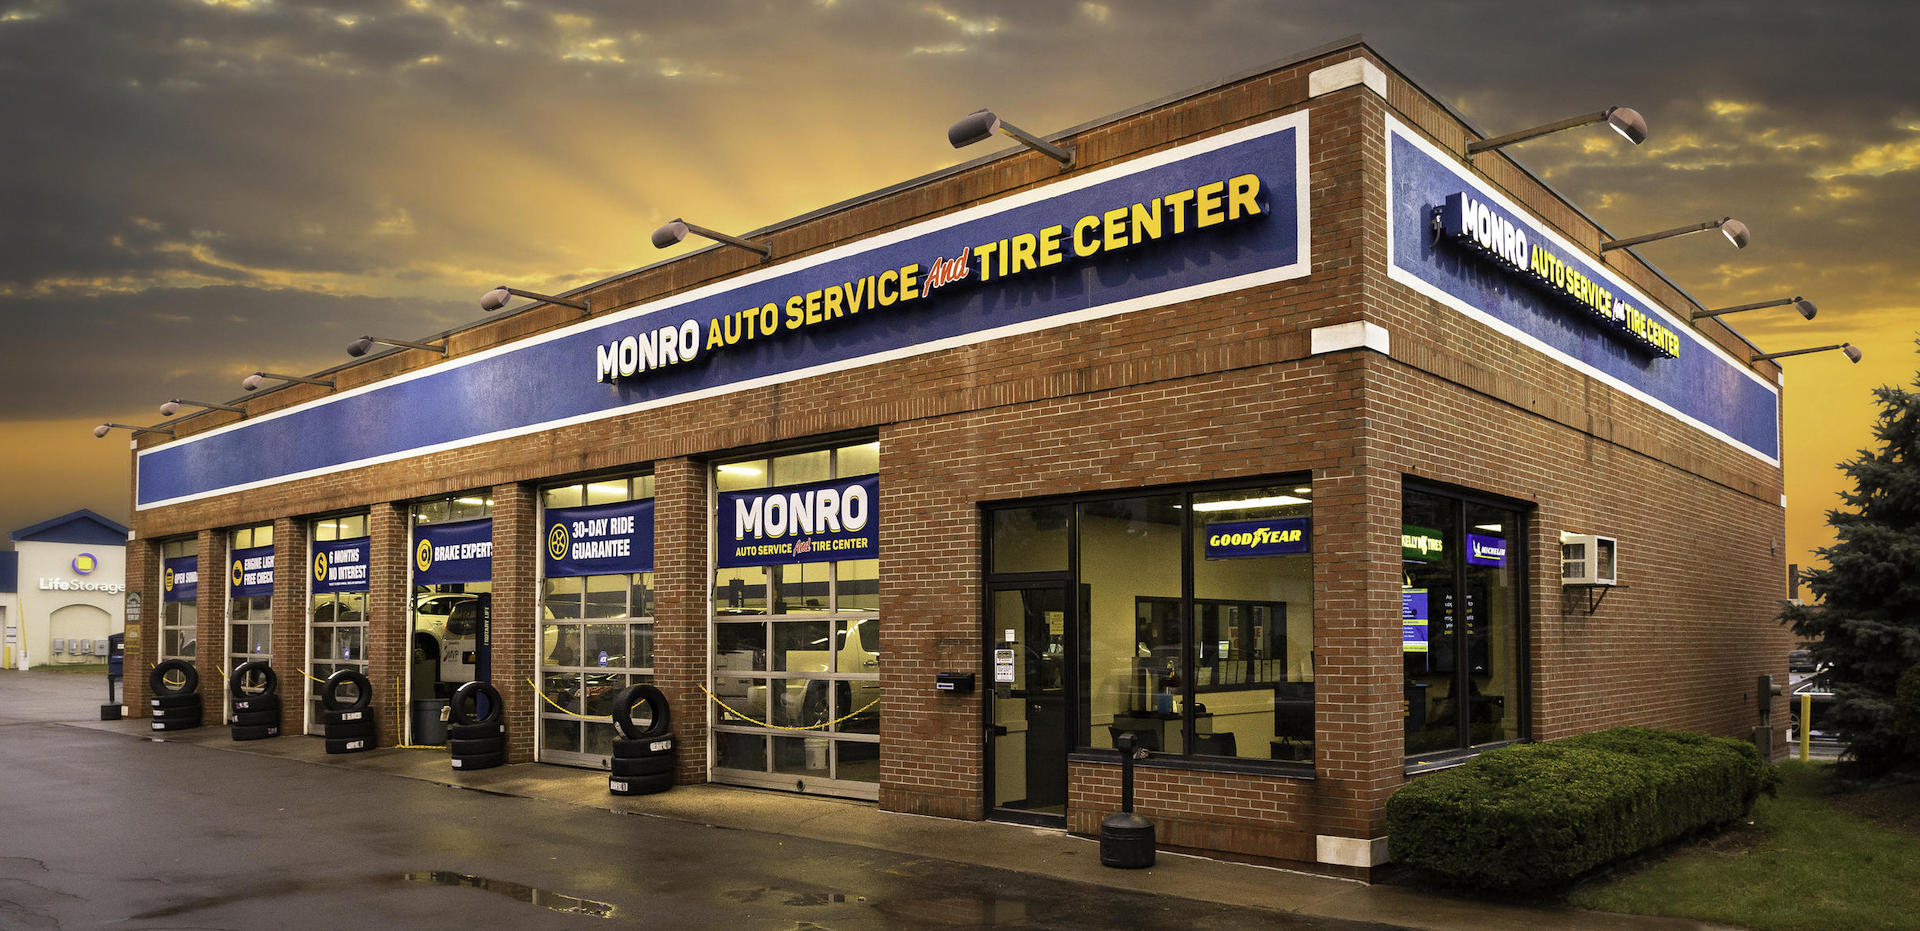 Monro exterior building